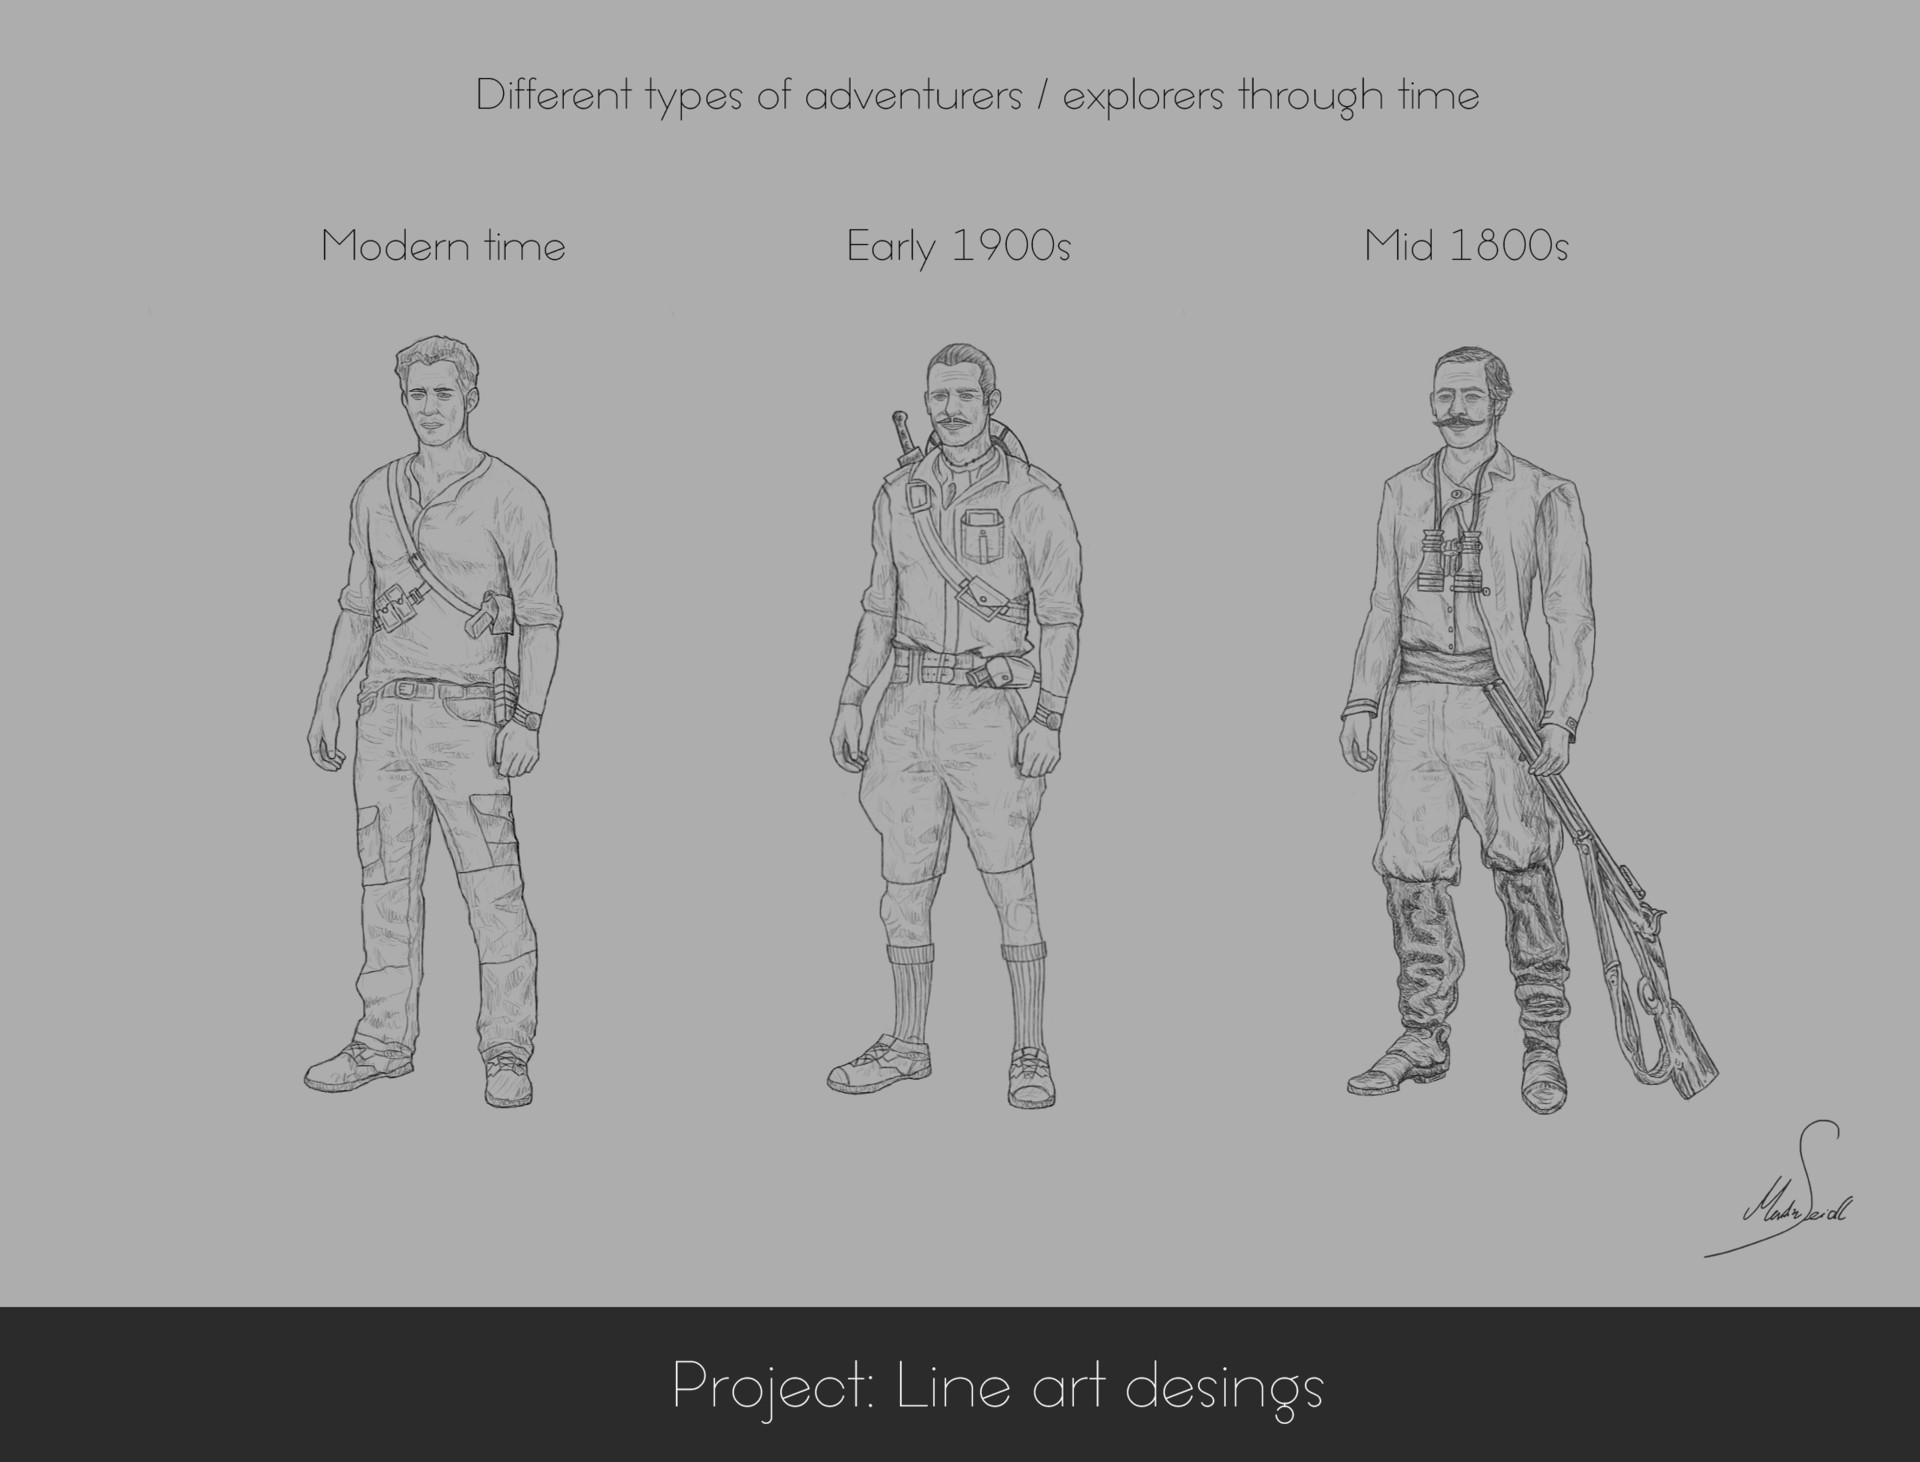 Martin seidl stylesheet character explorers